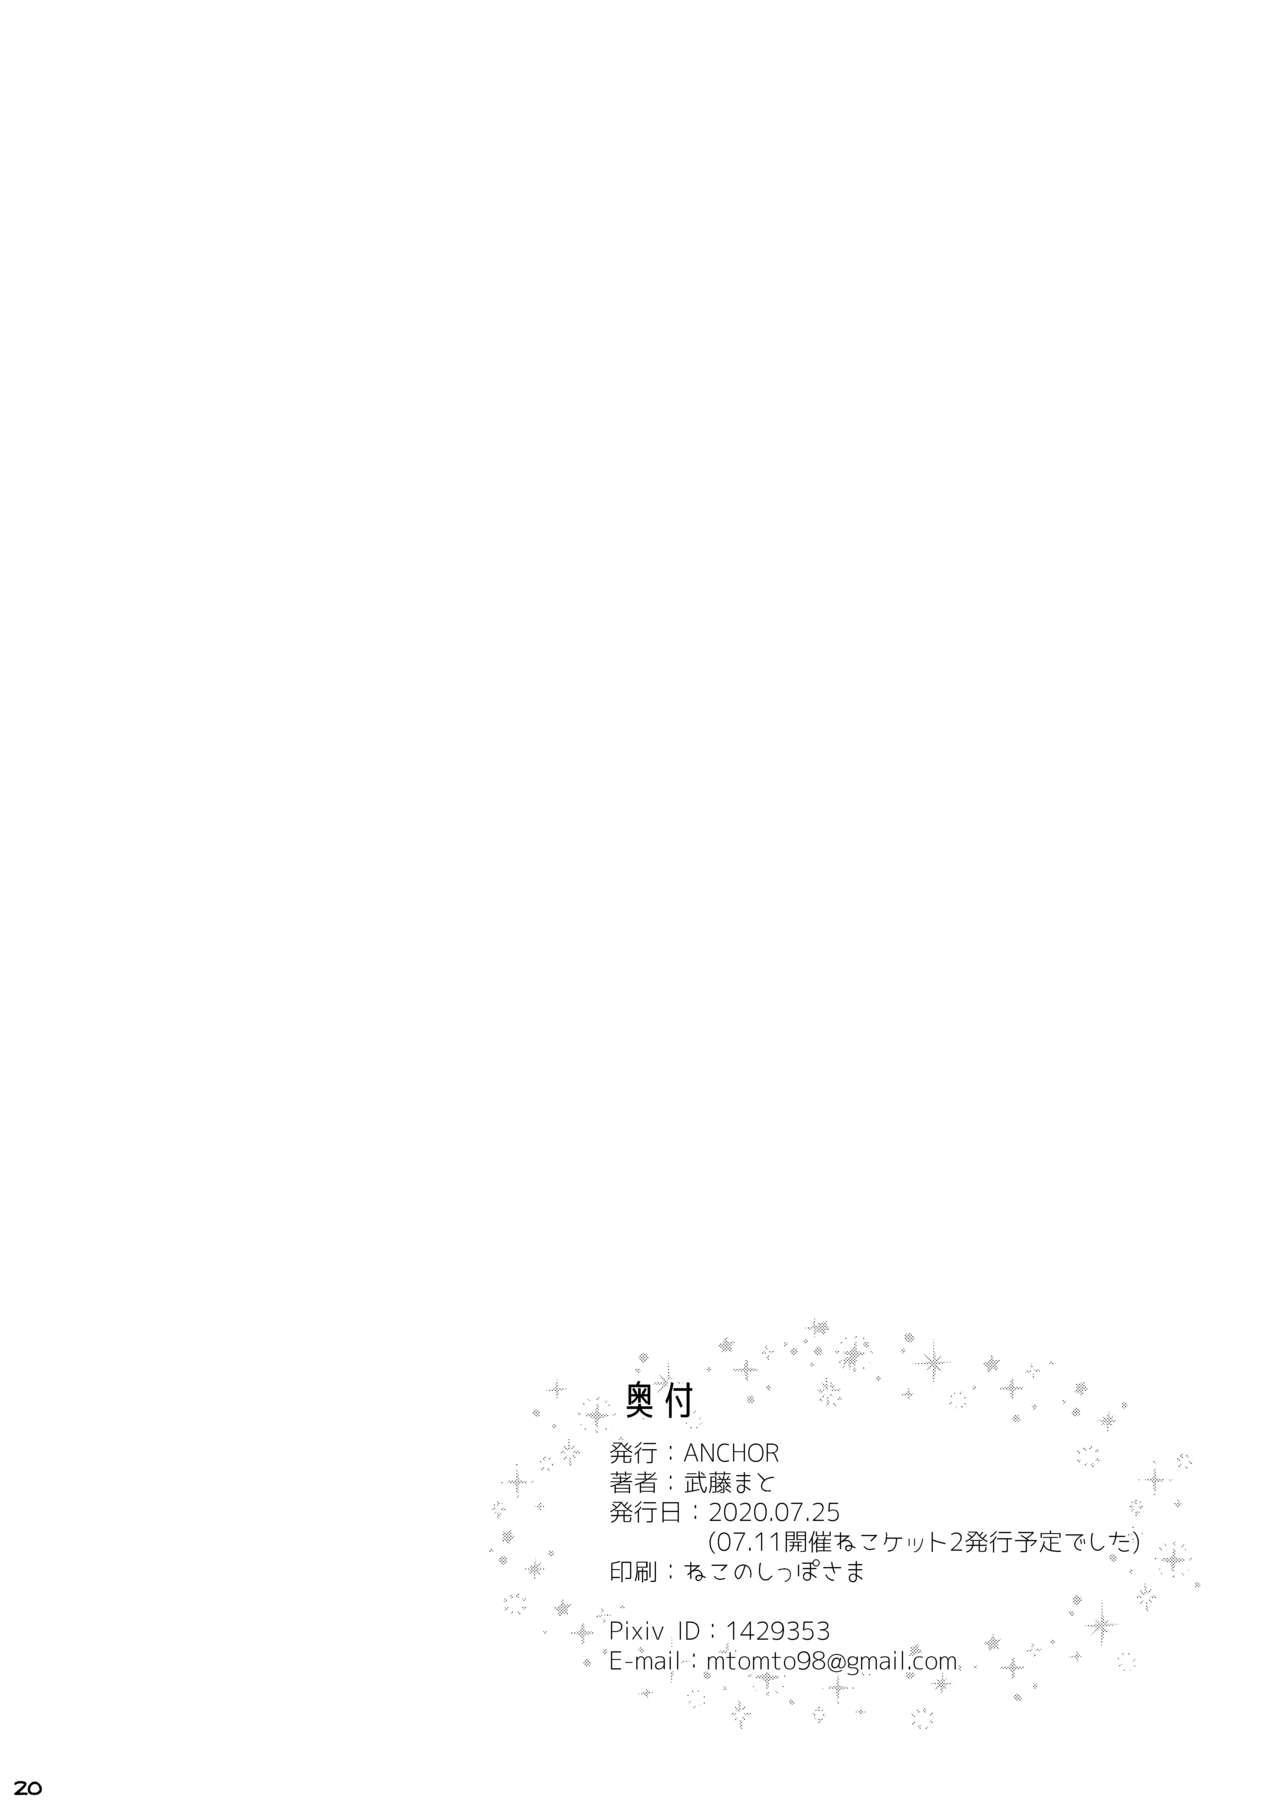 Nekomimichia-chan wa o sawari kinshi! 20